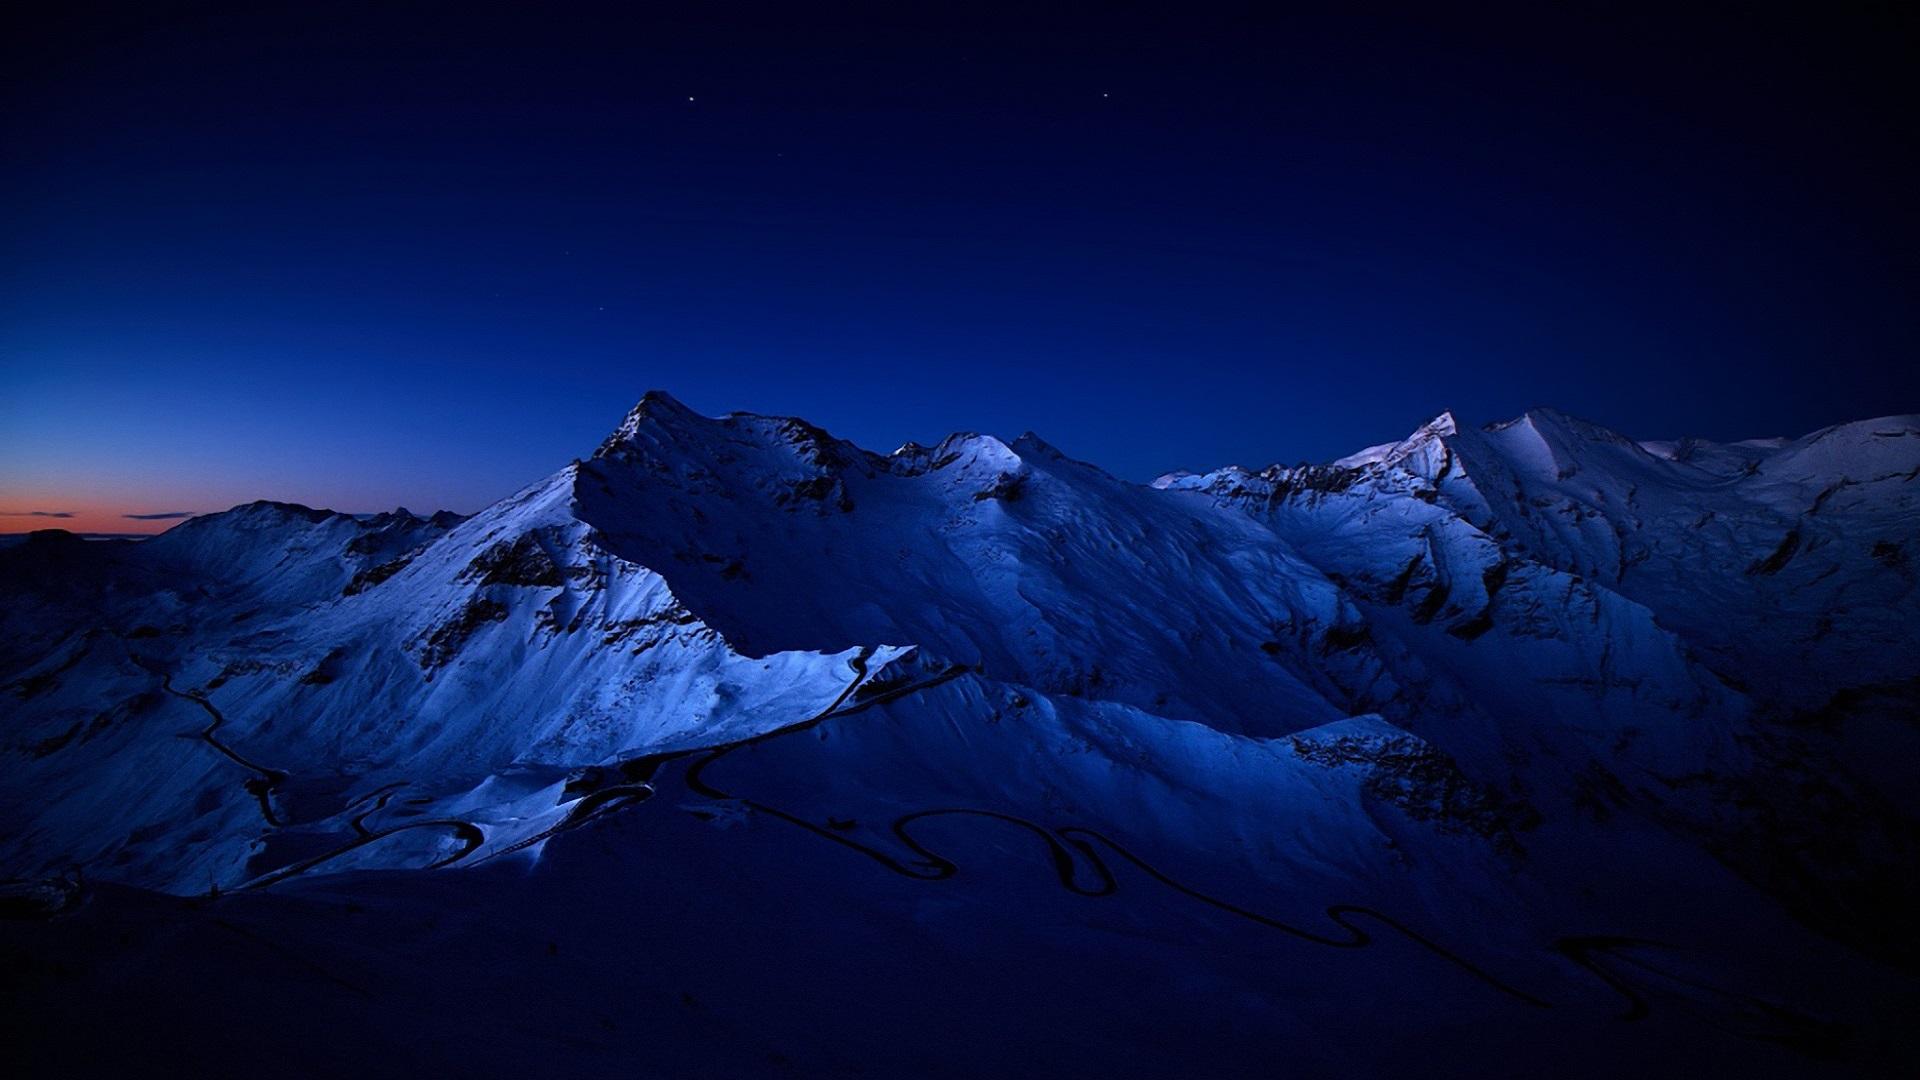 6776514-beautiful-snowy-mountains